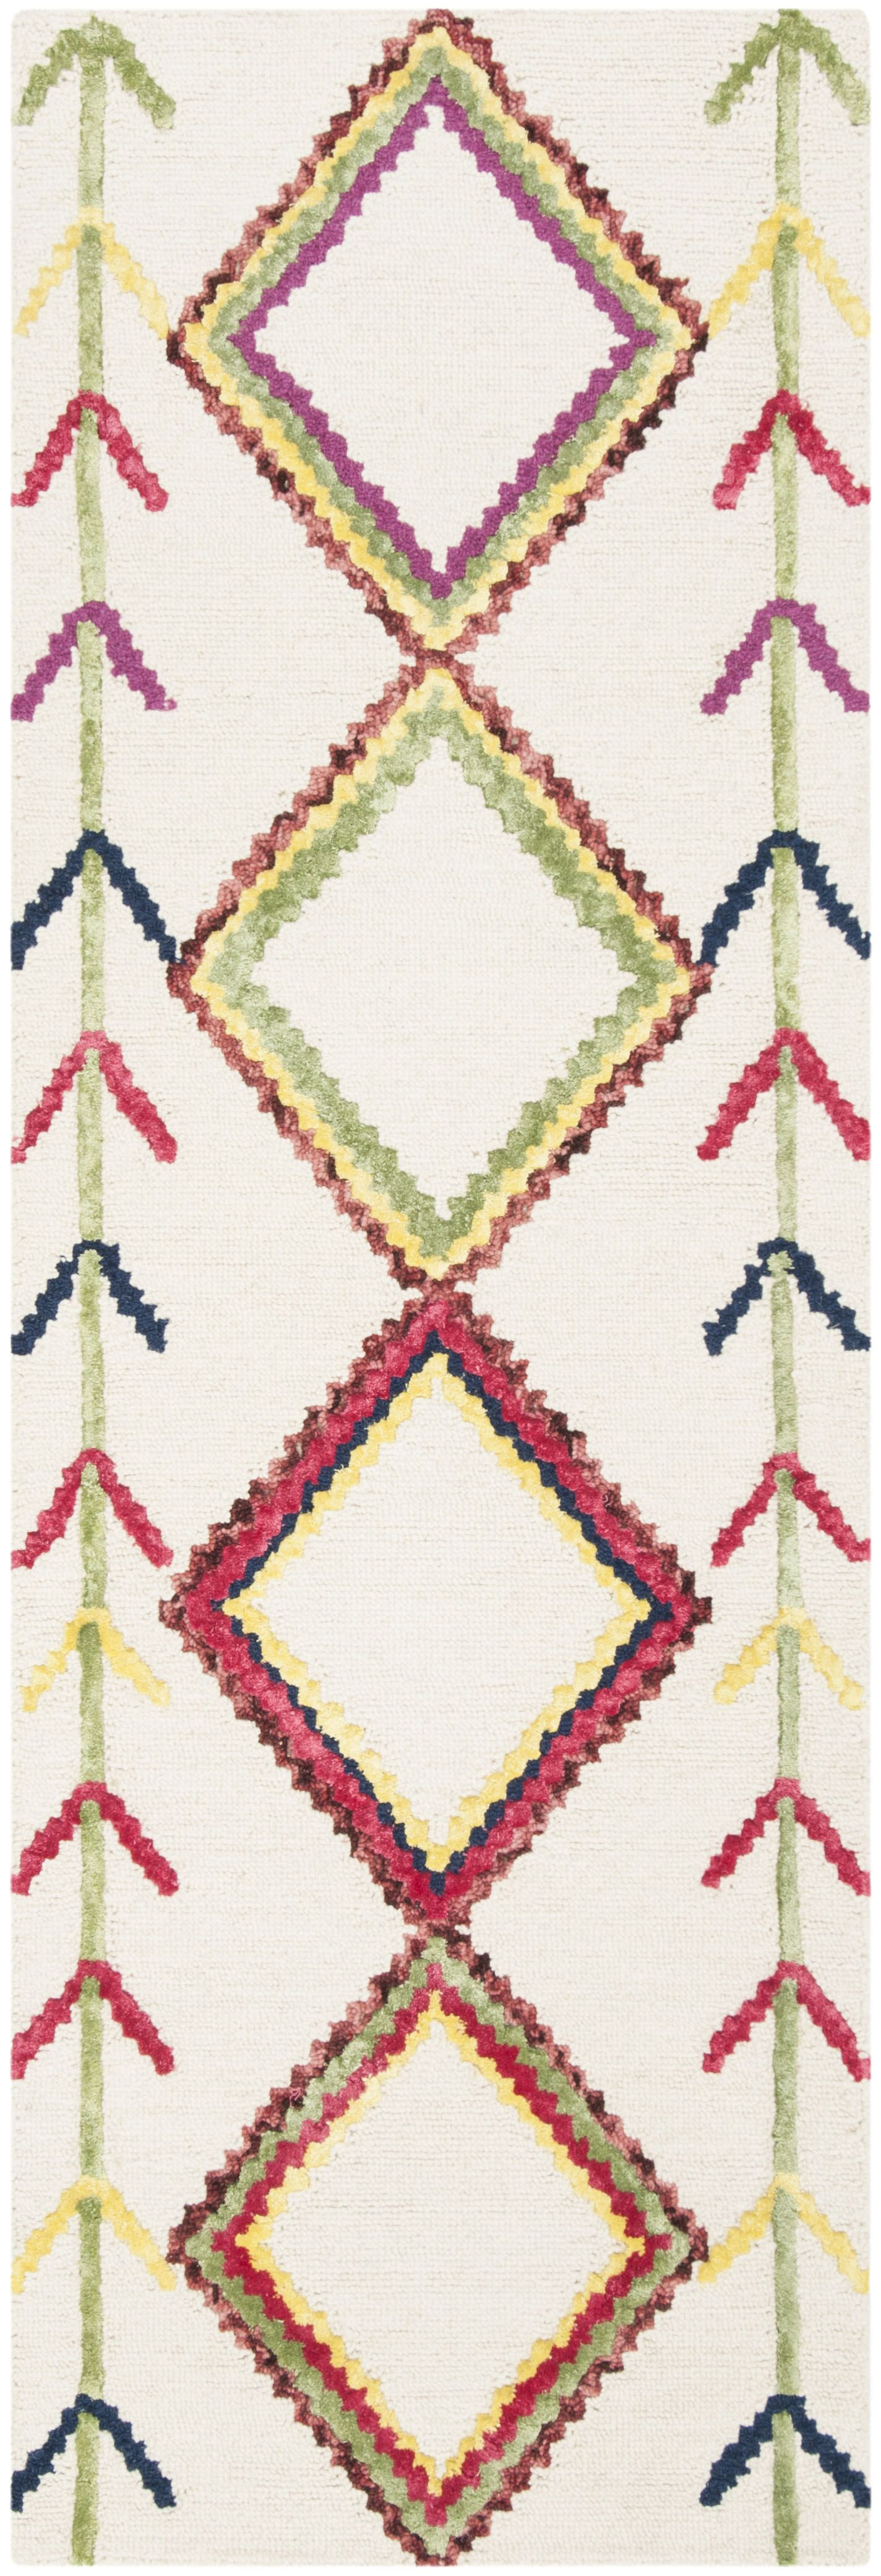 Juney Hand-Tufted Wool Ivory Area Rug Rug Size: Runner 2'3